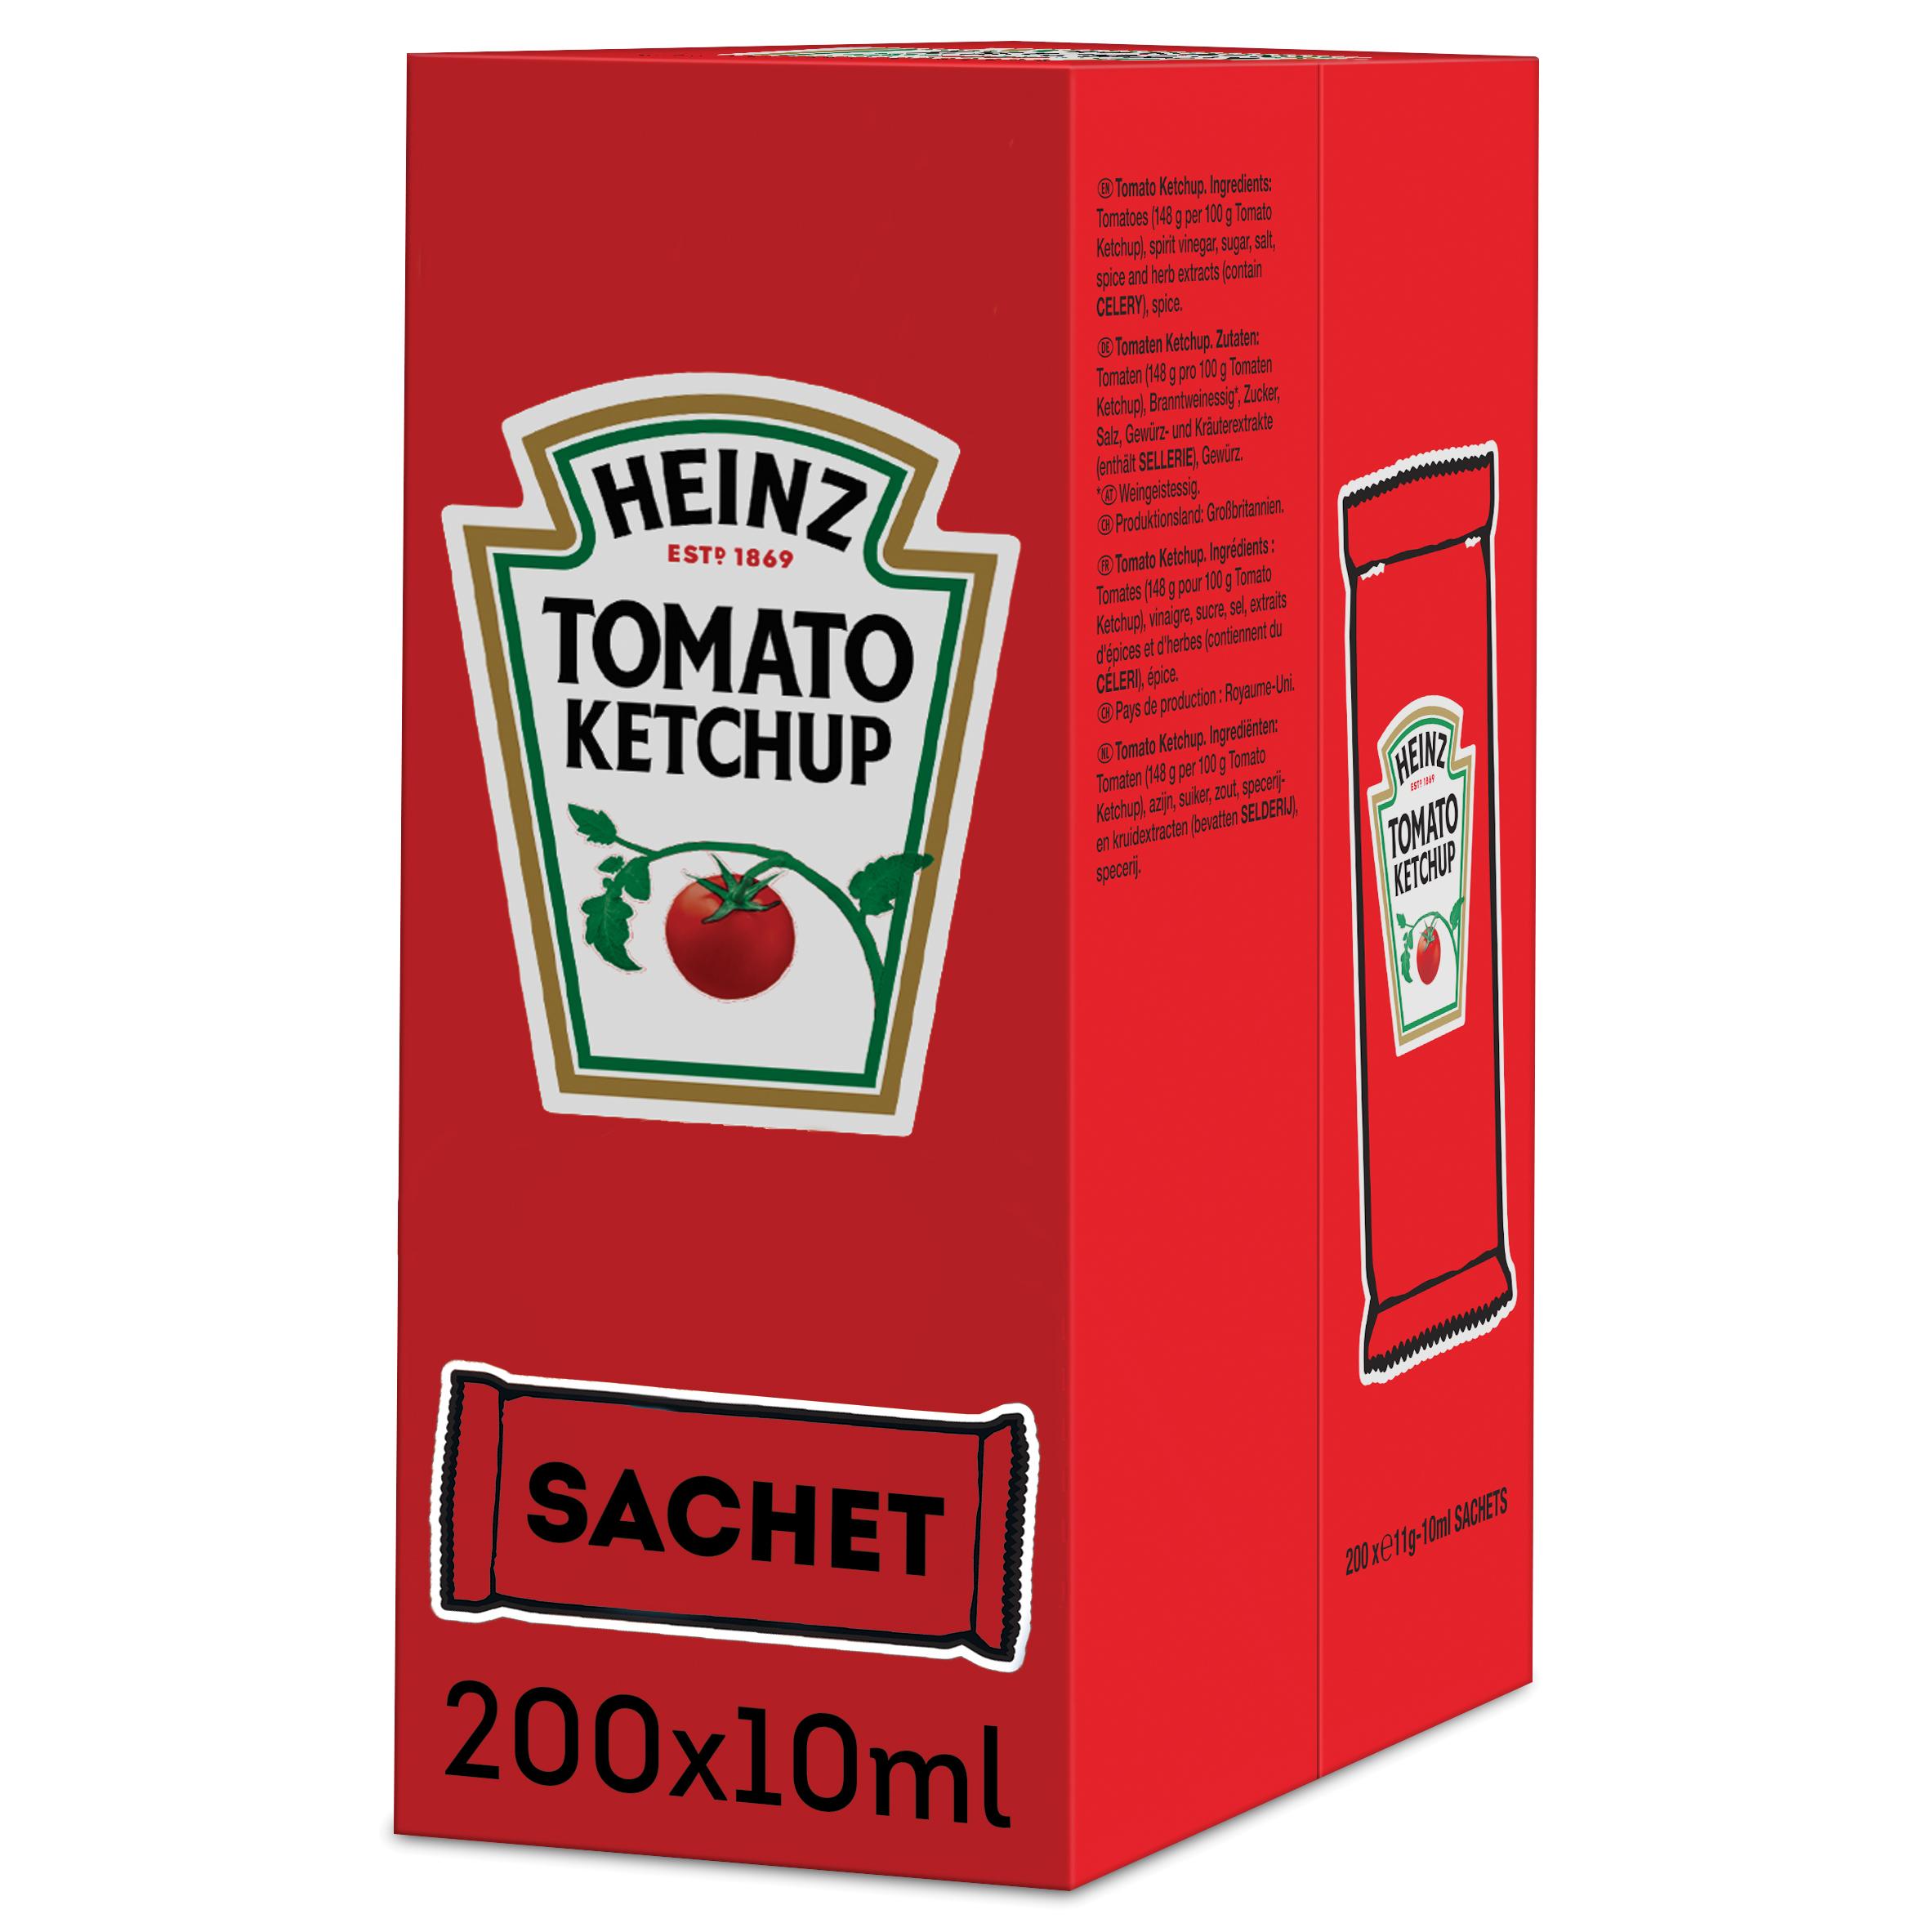 Heinz Tomato Ketchup 10ml sachet